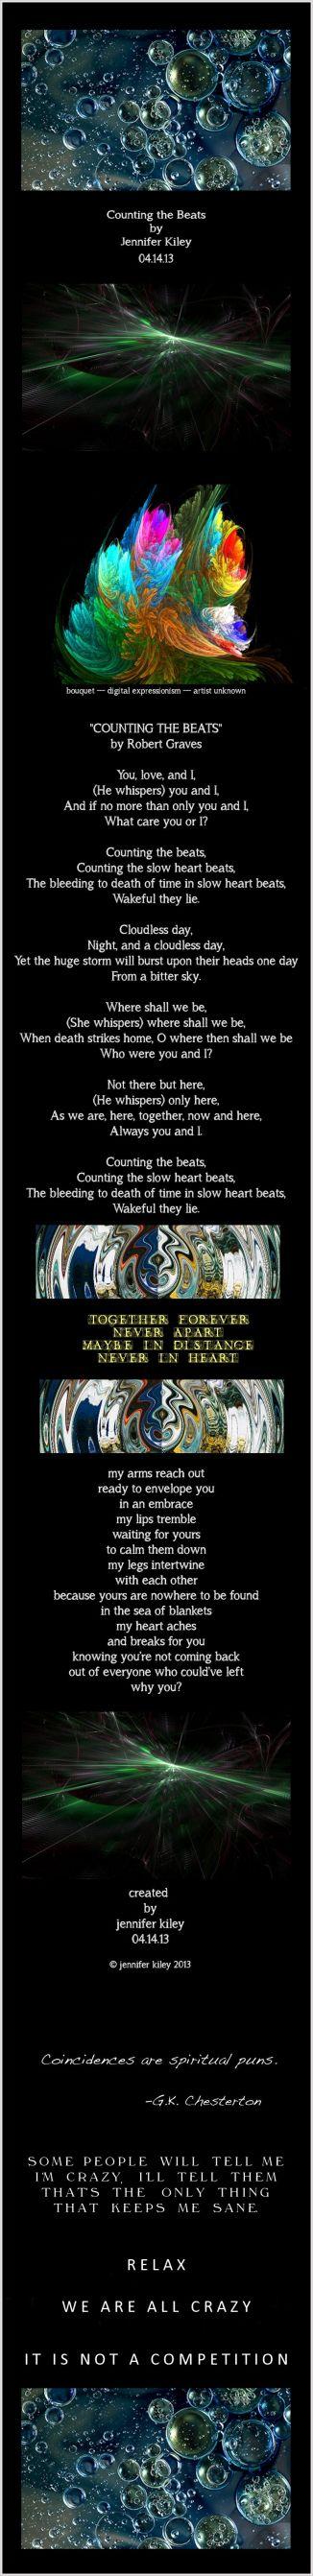 counting the beats by jennifer kiley (c) jennifer kiley 2013